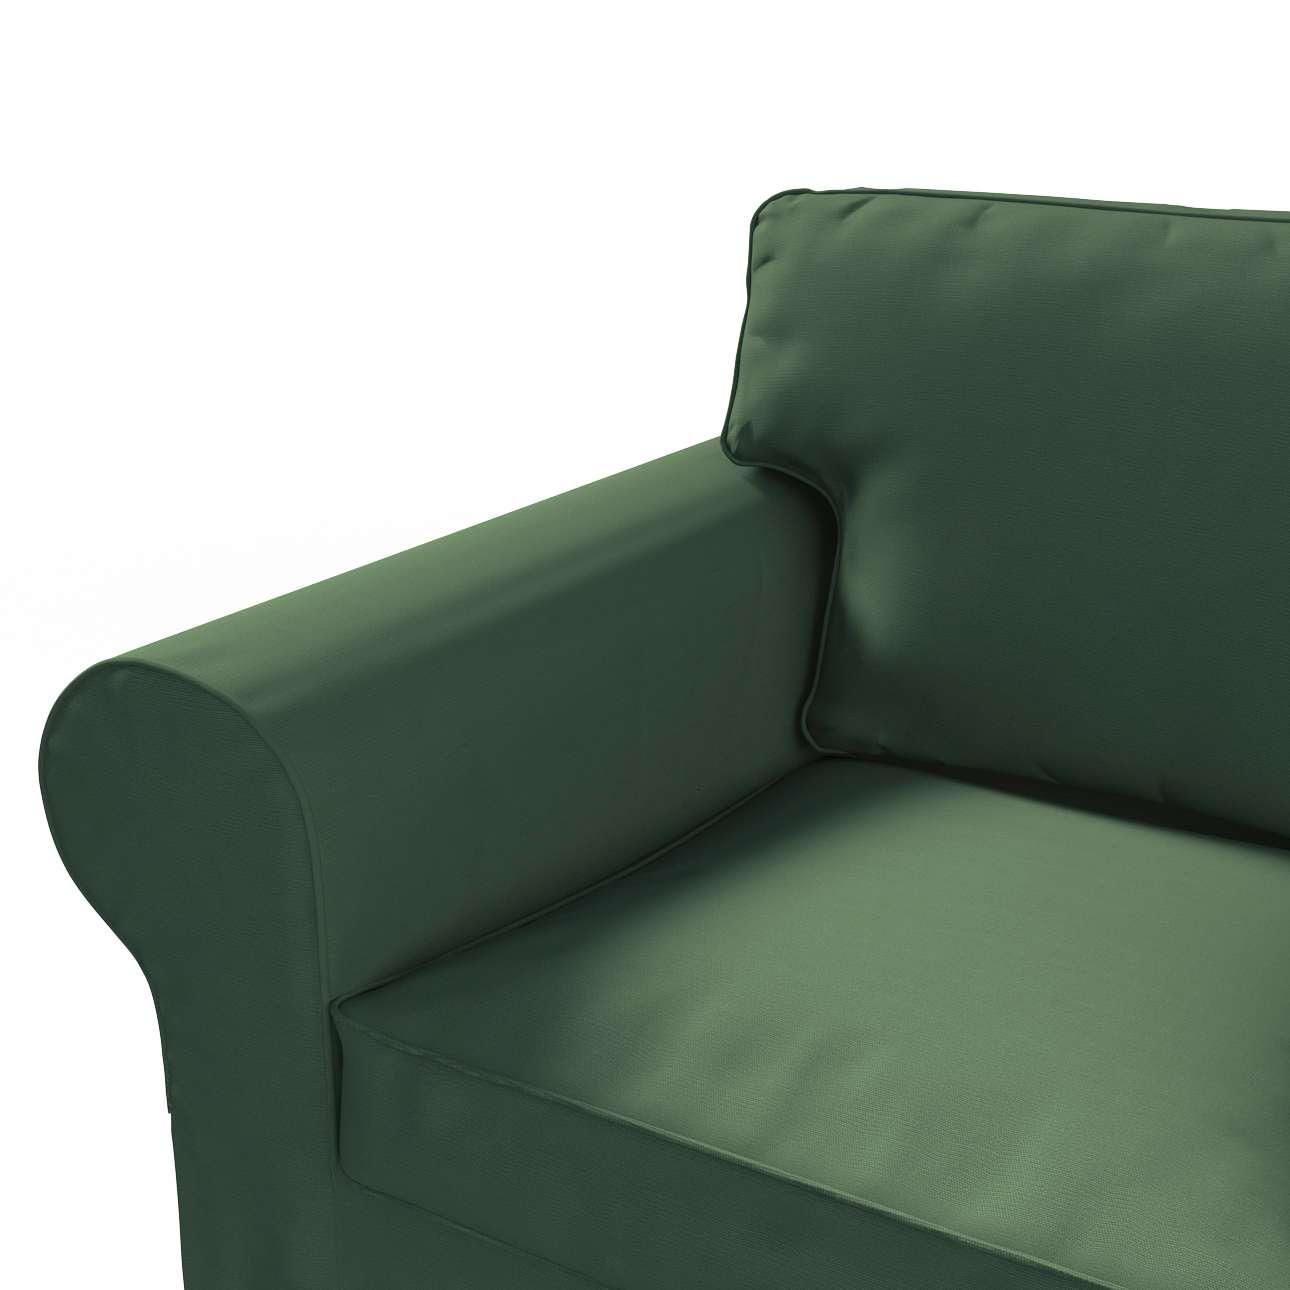 Ektorp 2-Sitzer Schlafsofabezug  ALTES Modell Sofabezug Ektorp 2-Sitzer Schlafsofa altes Modell von der Kollektion Cotton Panama, Stoff: 702-06